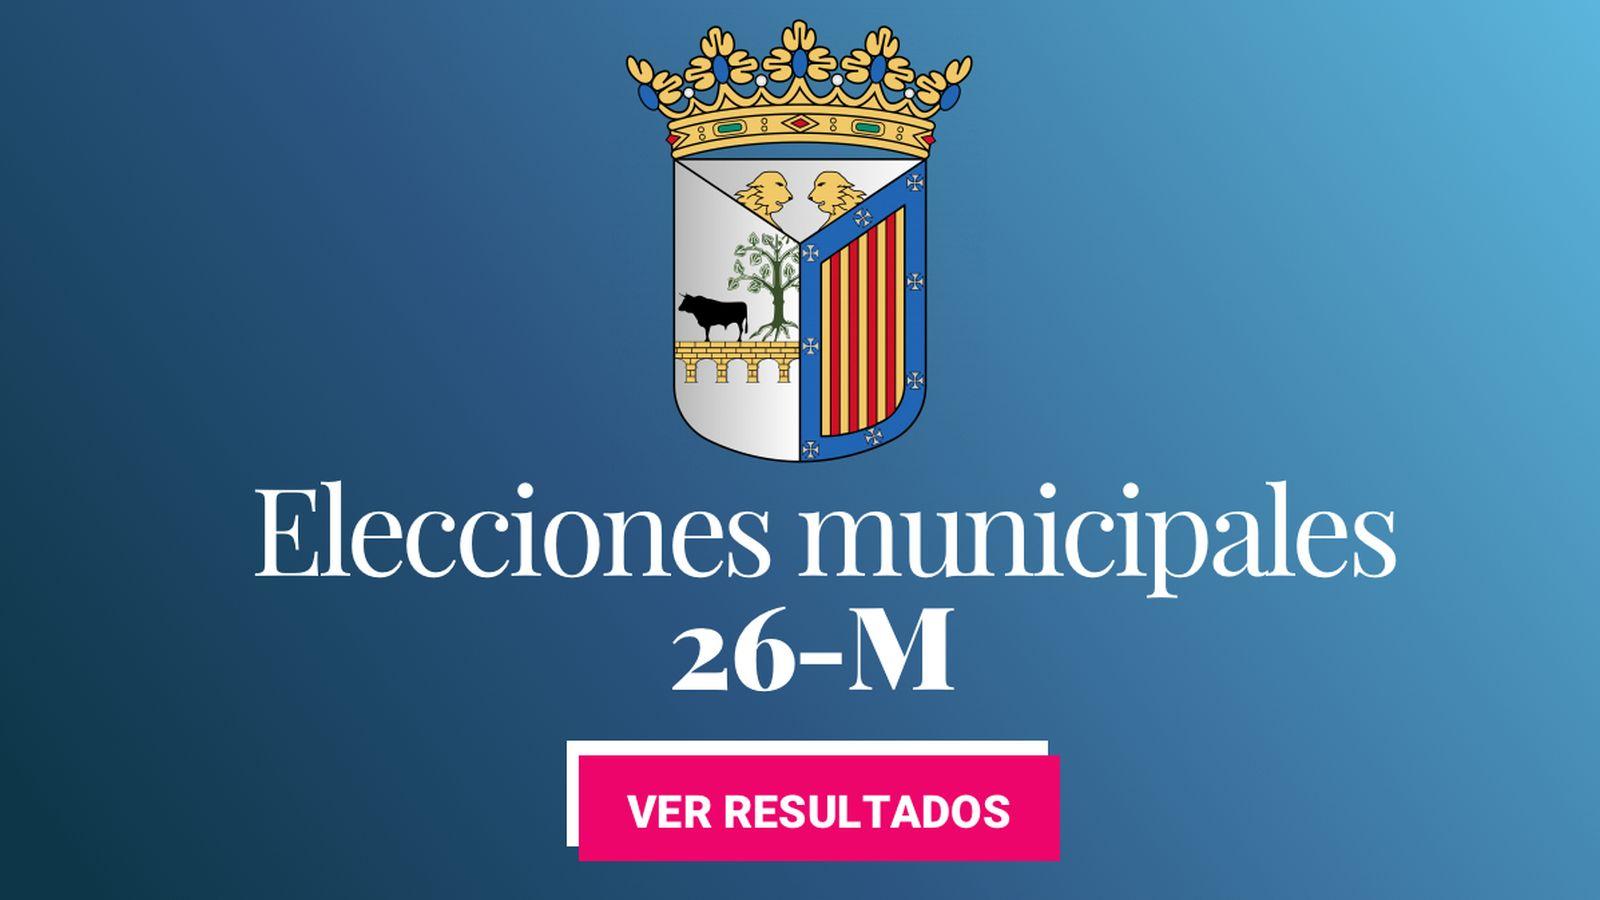 Foto: Elecciones municipales 2019 en Salamanca. (C.C./EC)